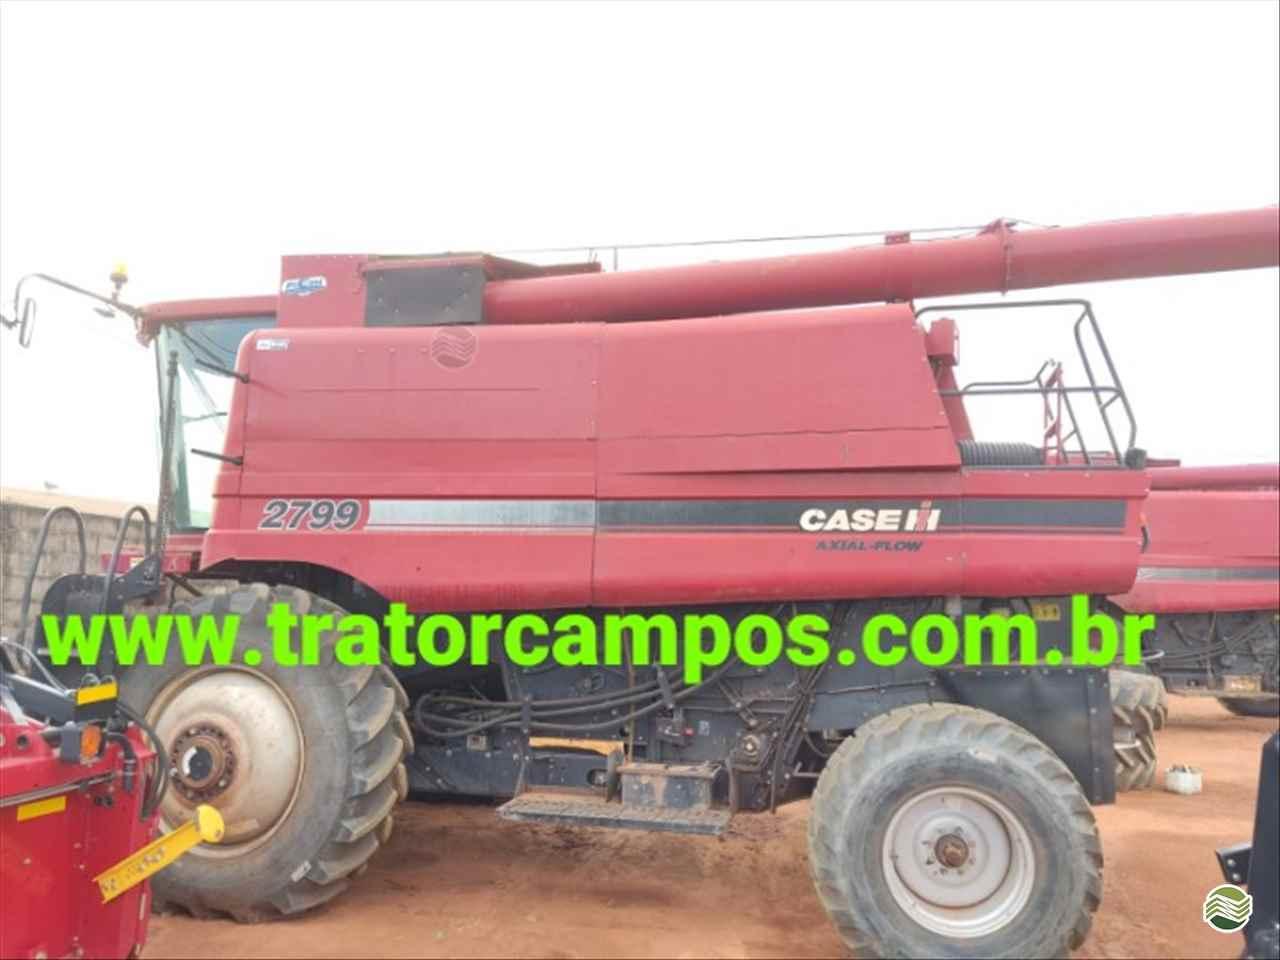 COLHEITADEIRA CASE CASE 2799 Trator Campos GUAPO GOIAS GO